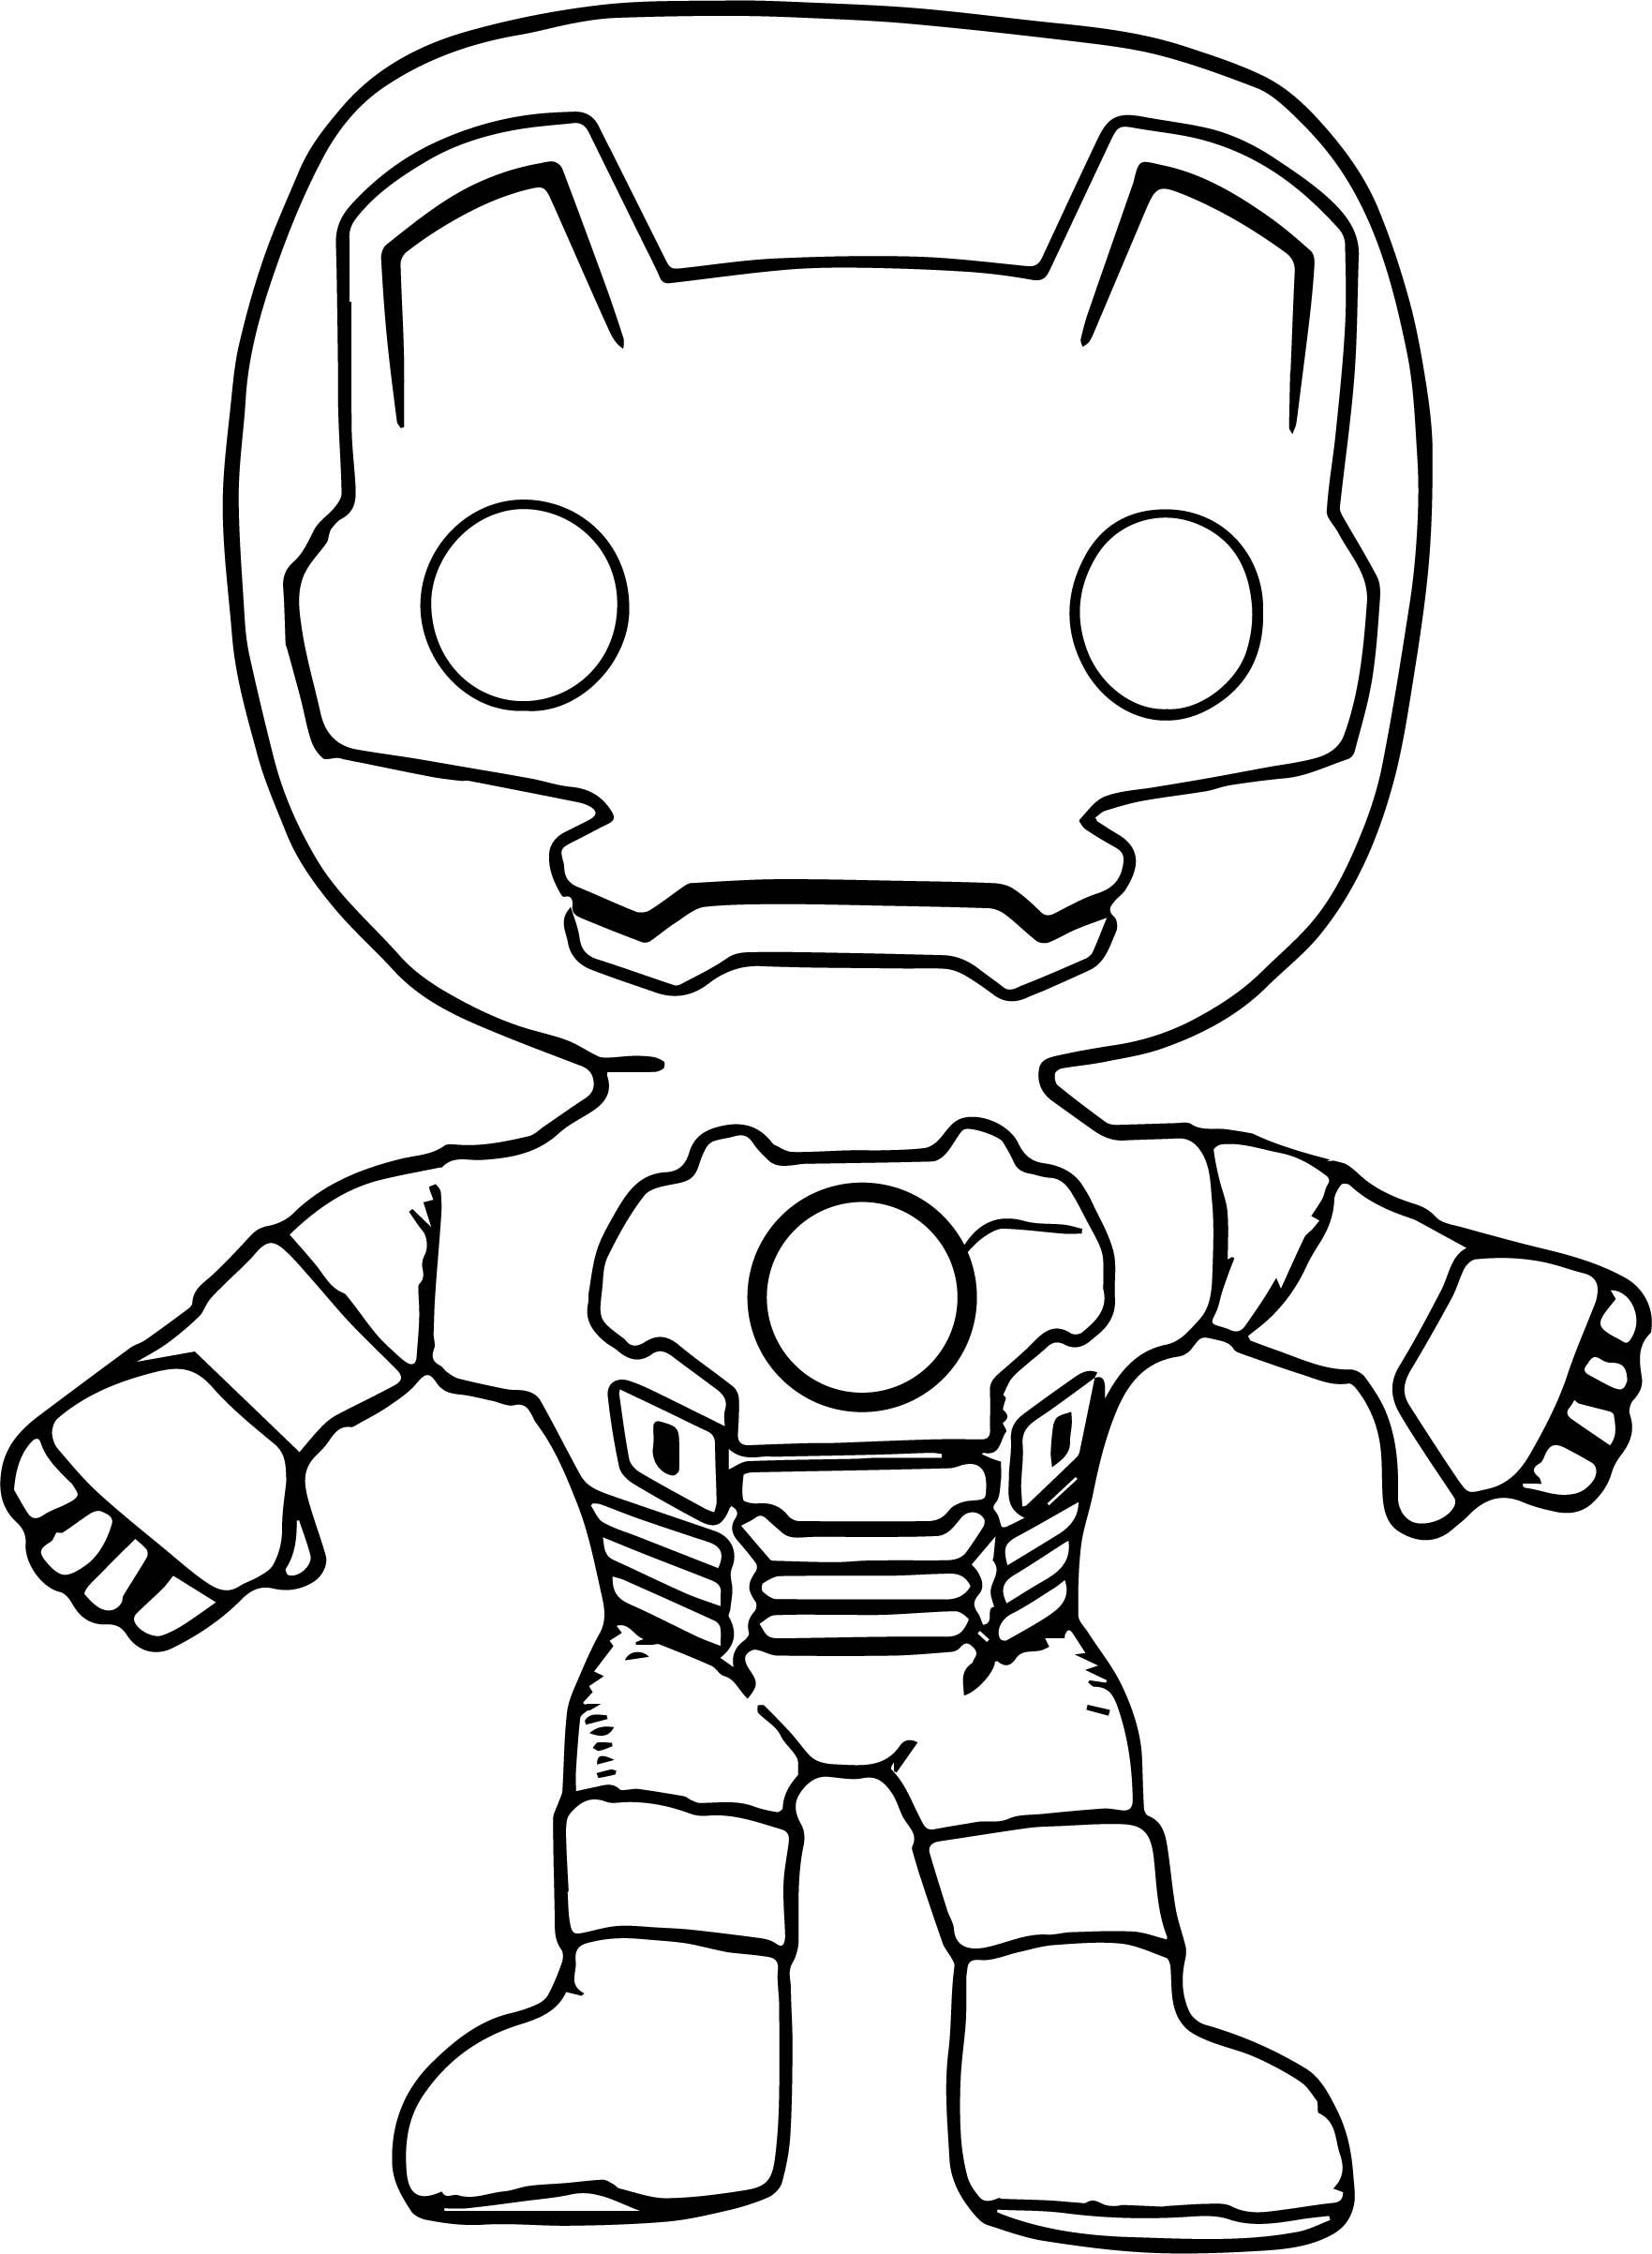 Cool Avengers Iron Man Chibi Coloring Page